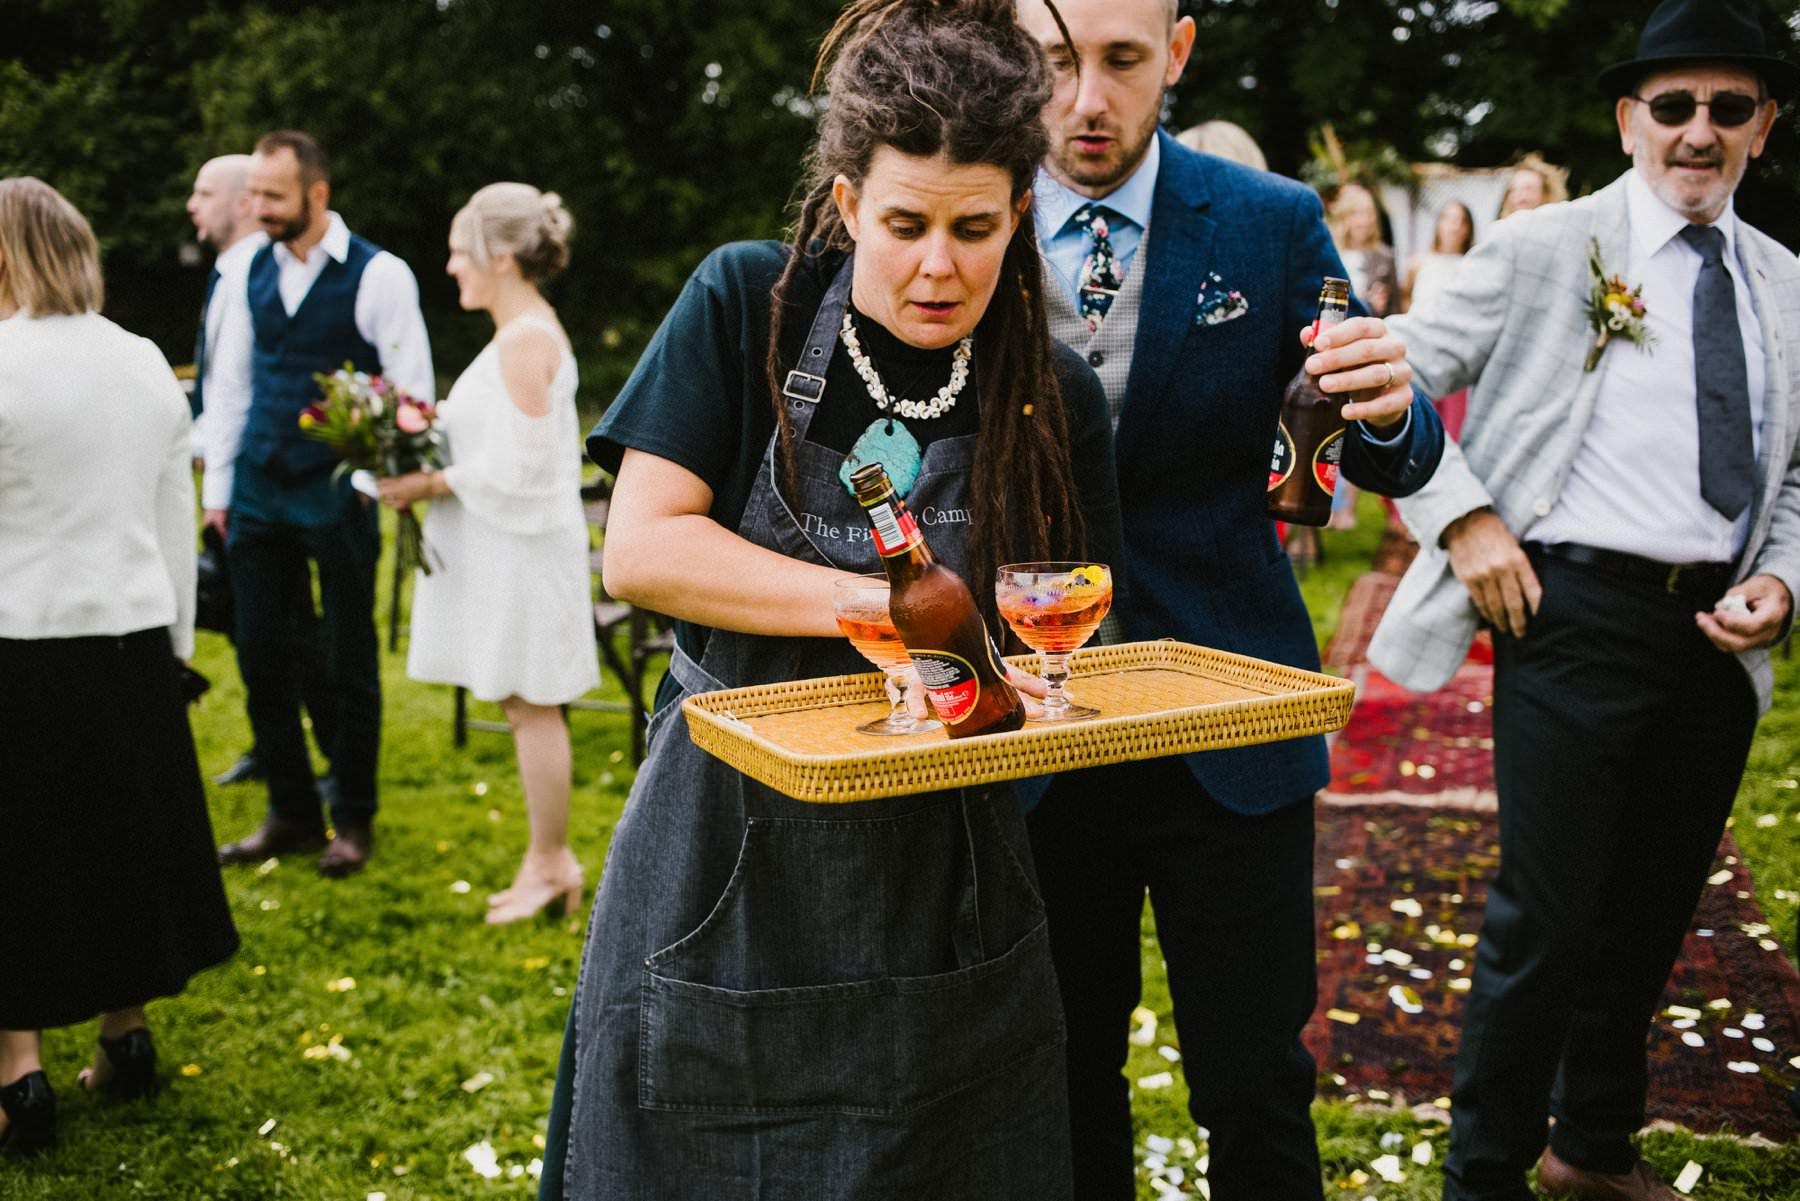 waitress spills beer funny moment at wedding